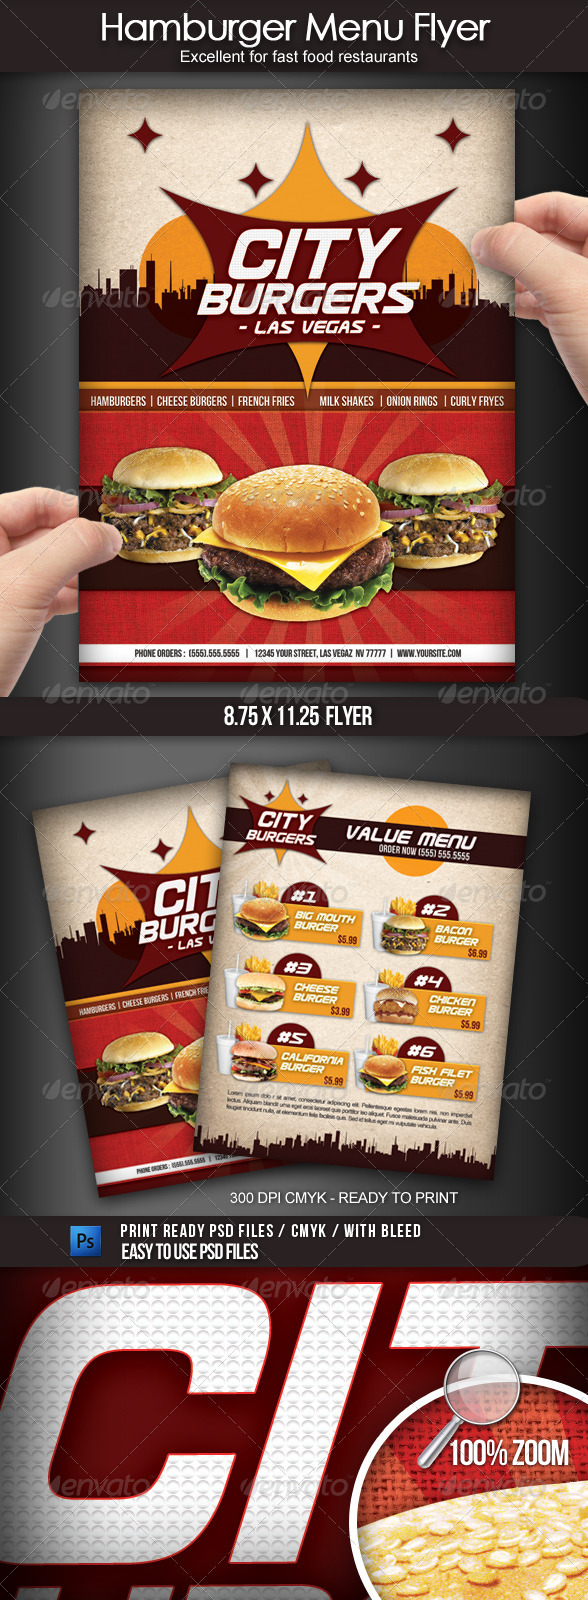 GraphicRiver Hamburger Restaurant Menu Flyer 2092834